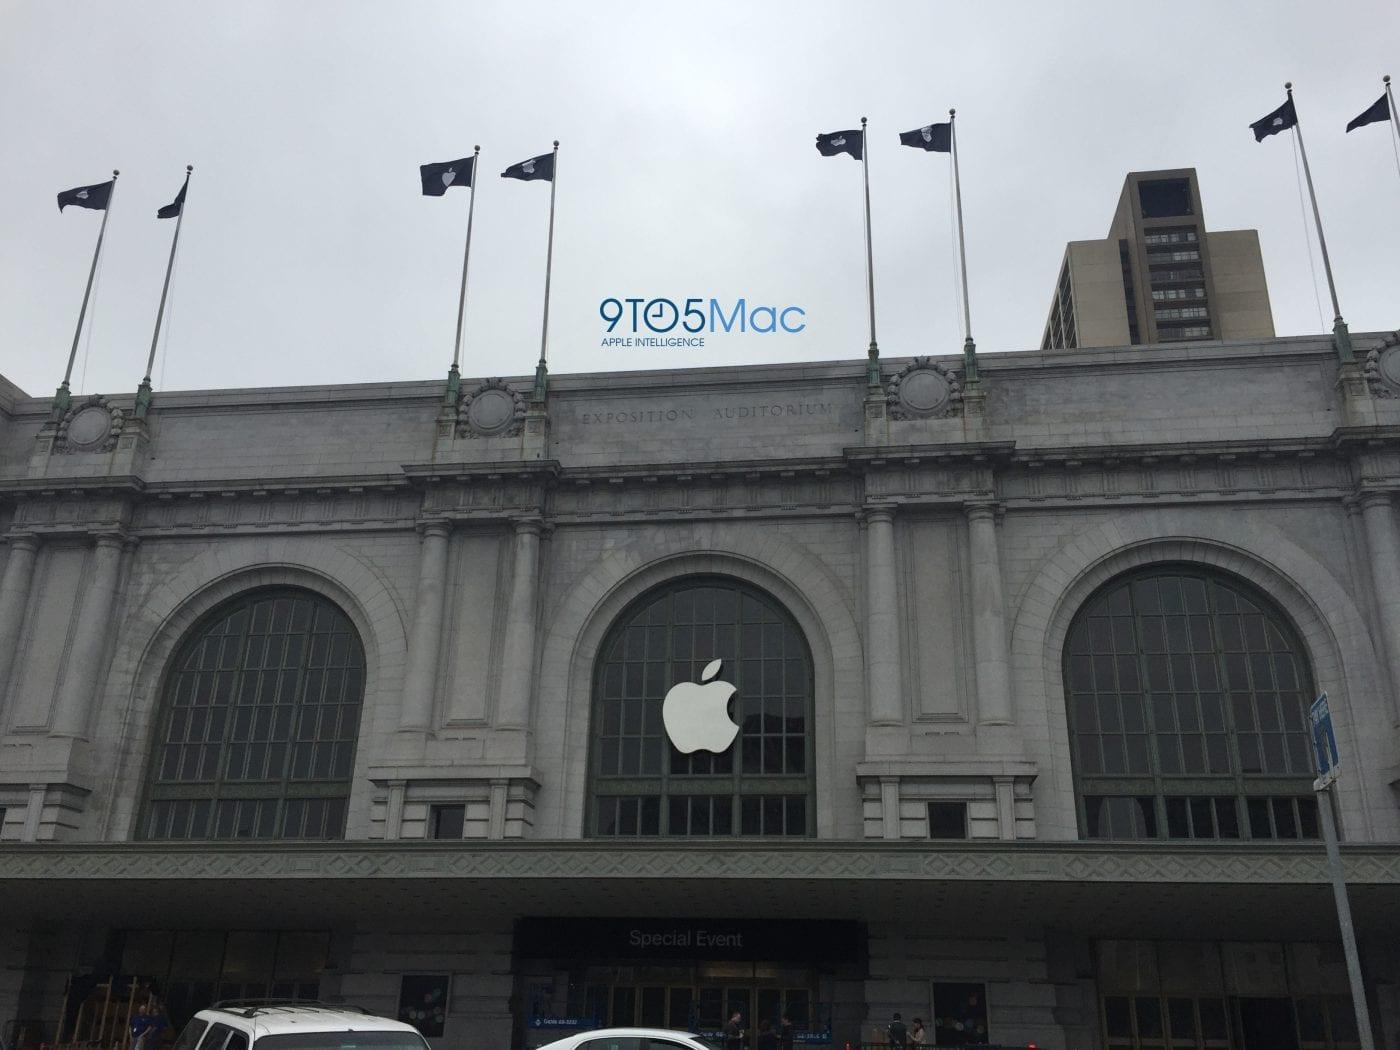 apple-iphone-7-event-vyzdoba1